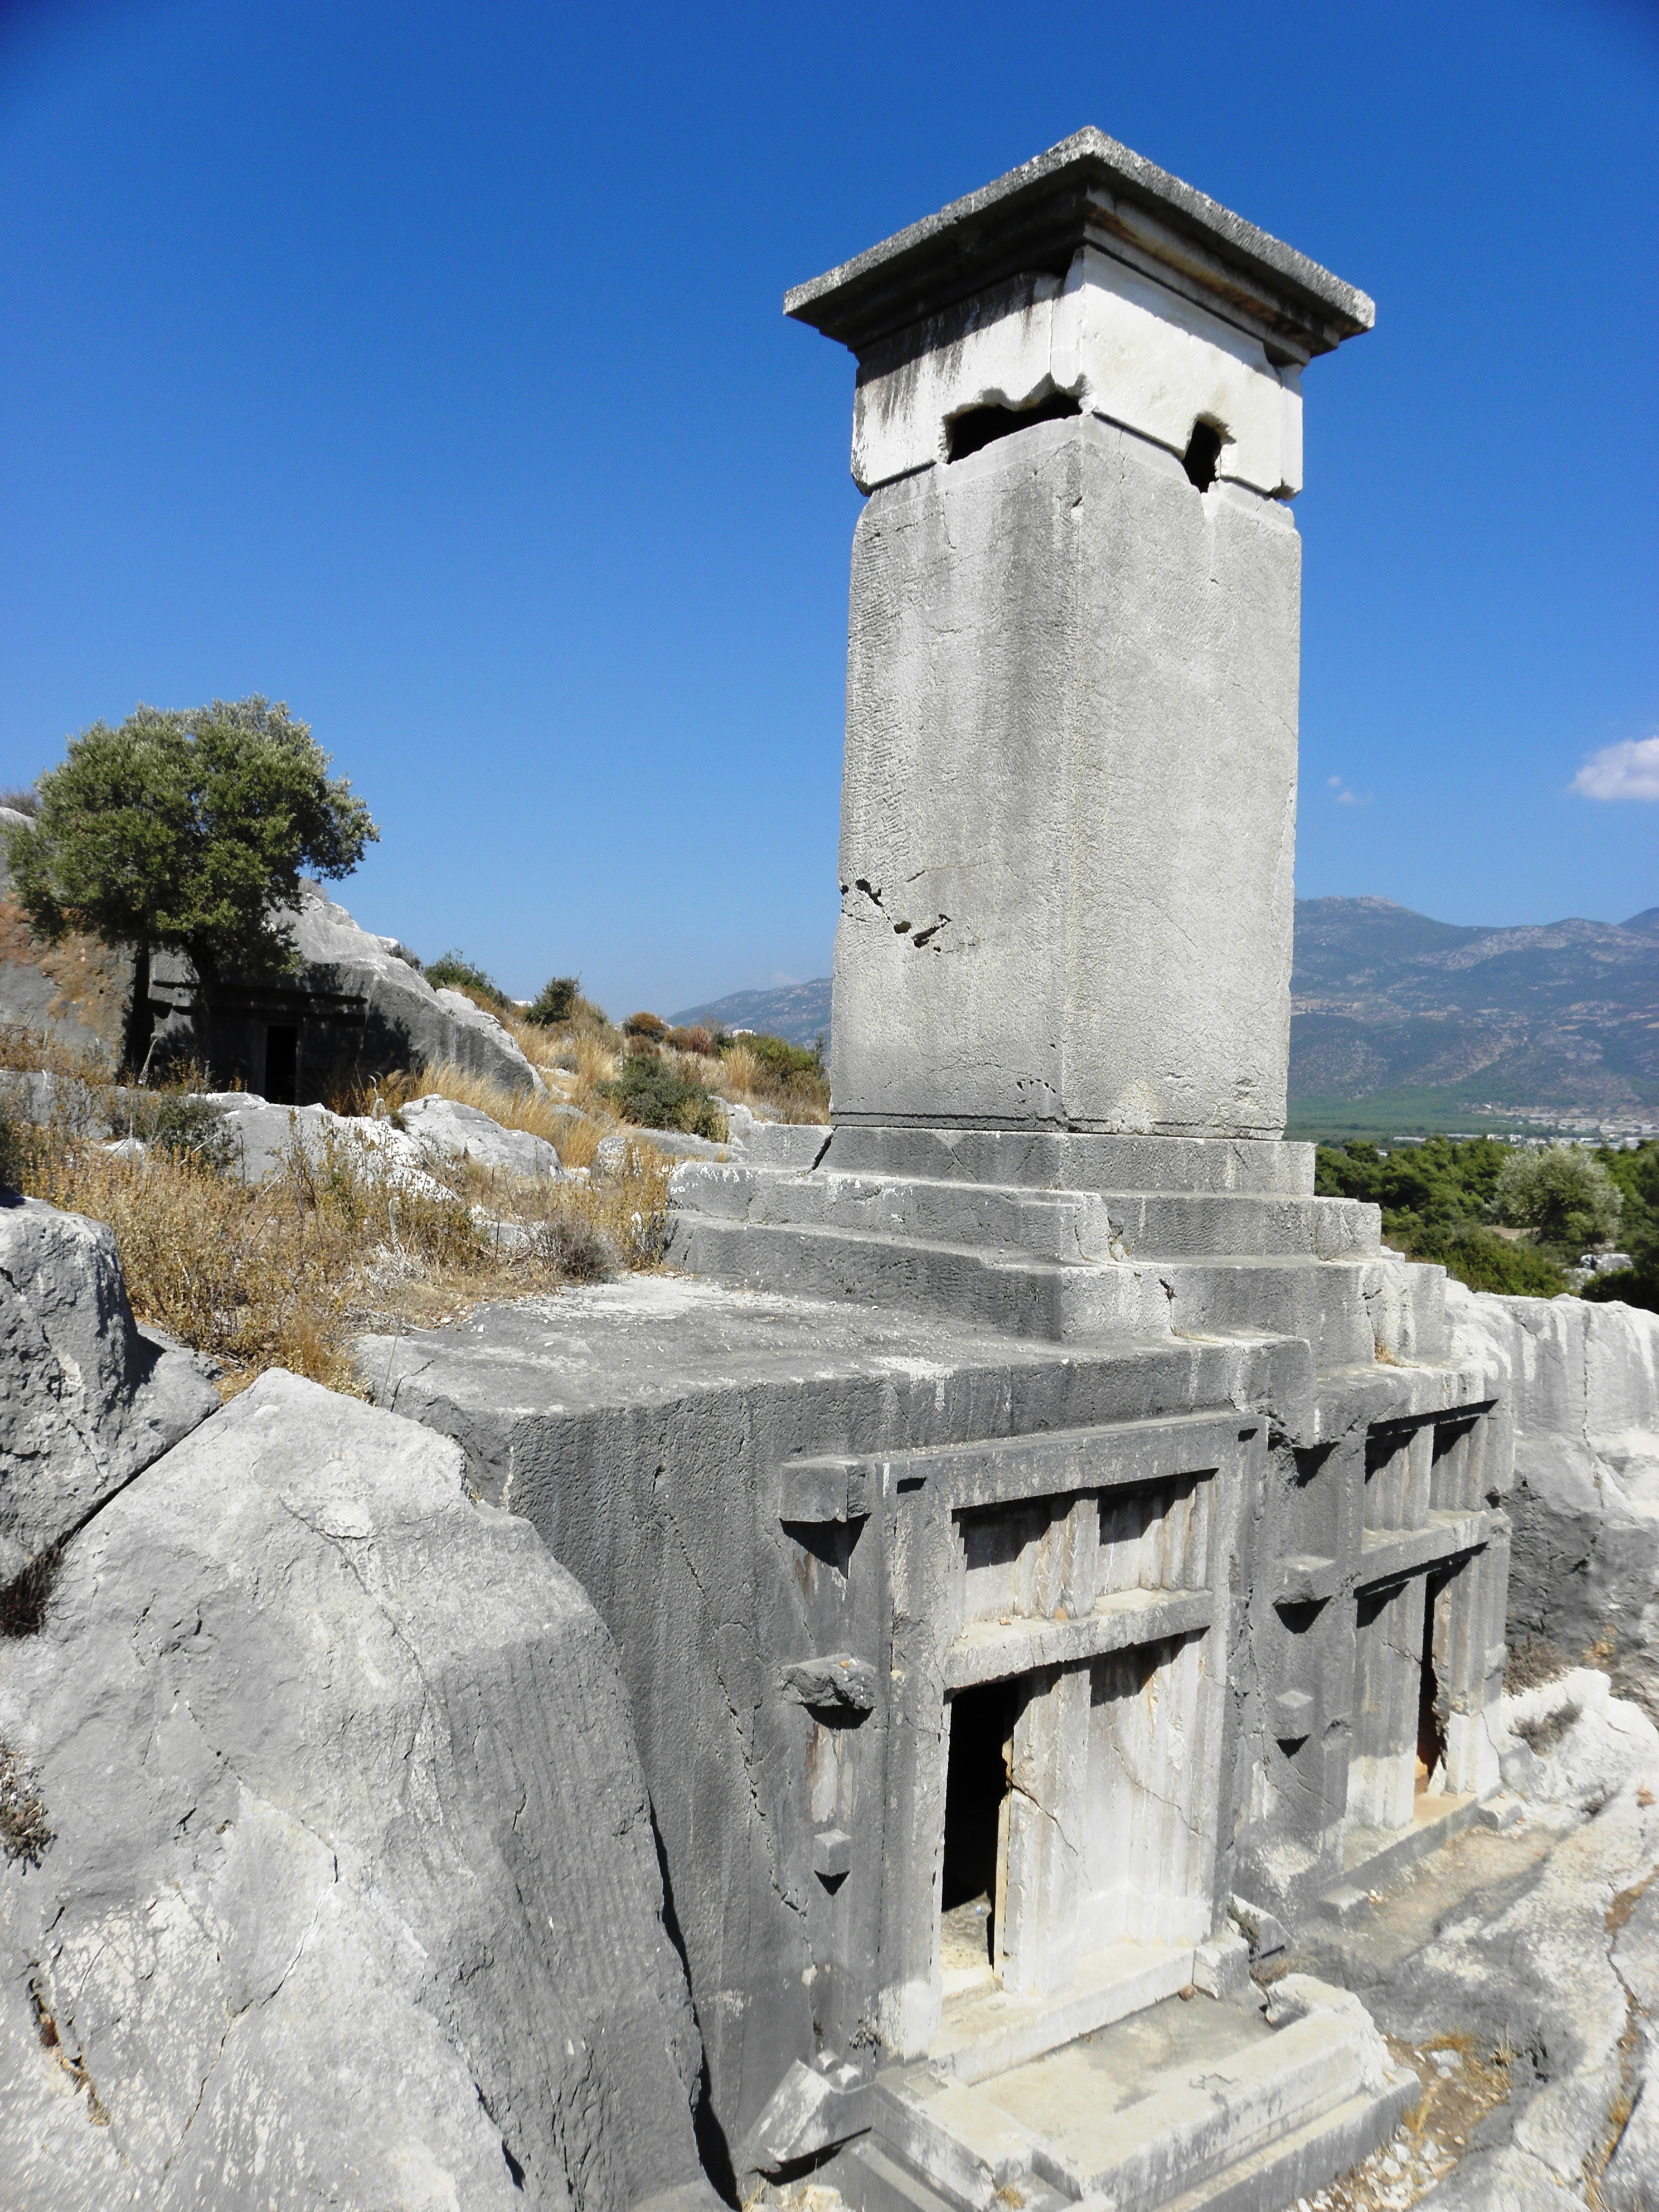 Rock tombs, Ancient, Rock, Tombs, Turkey, HQ Photo